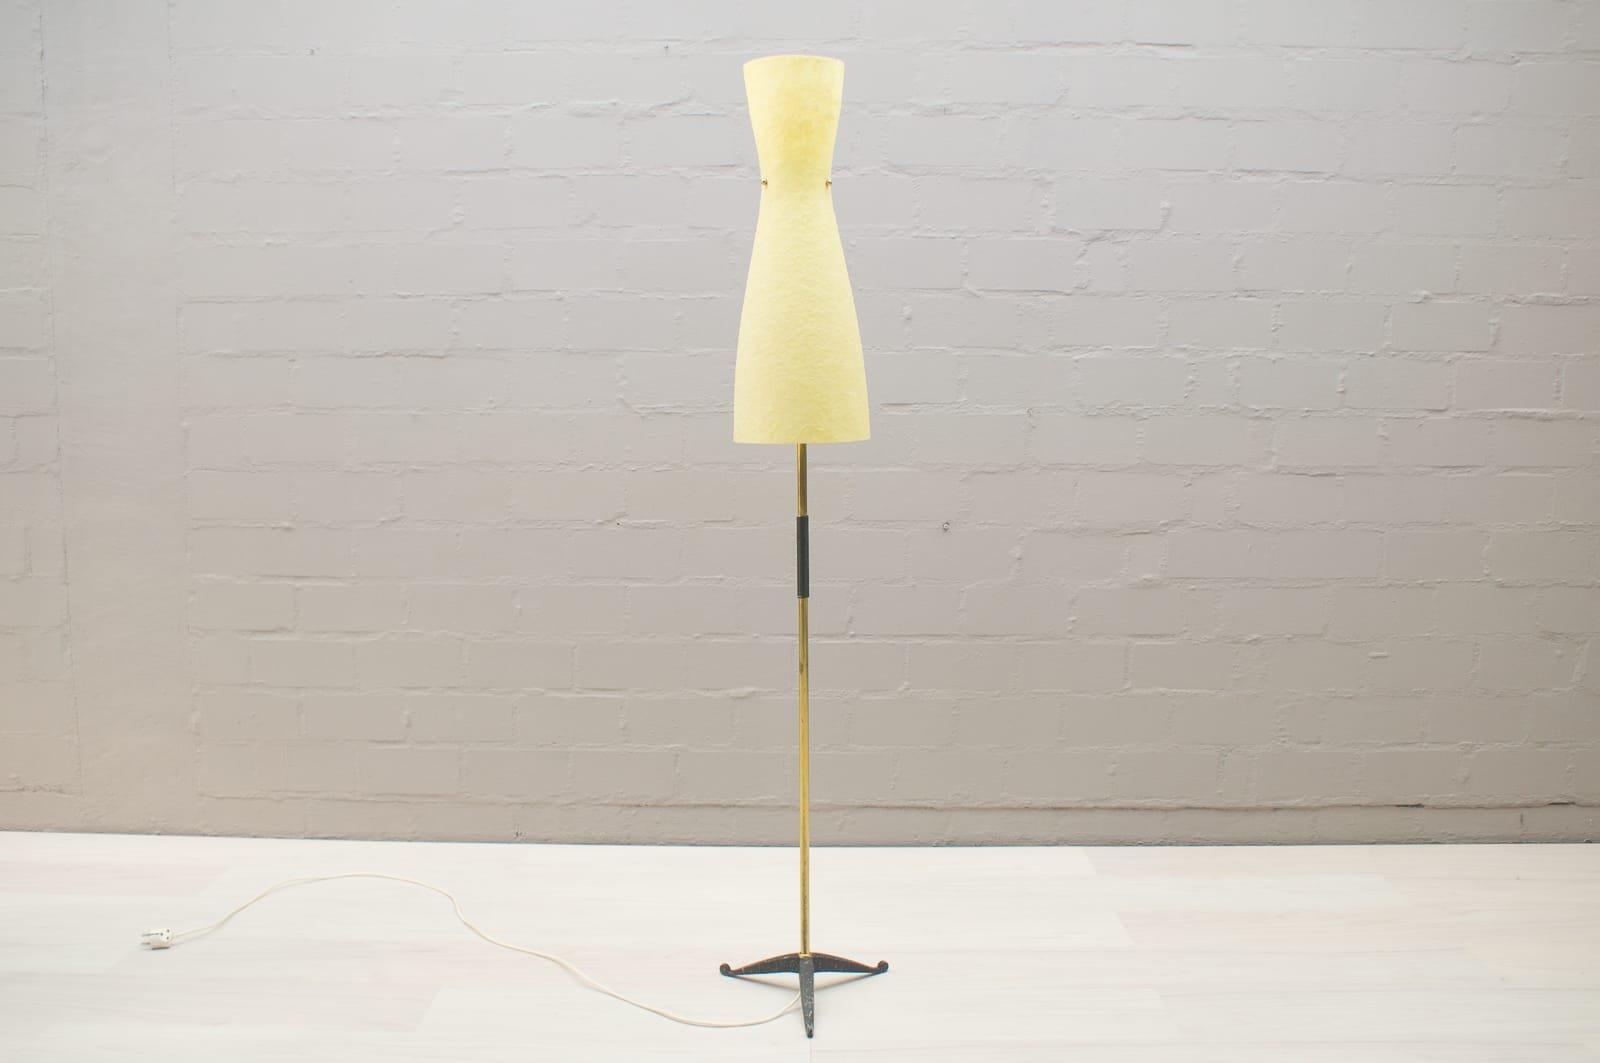 Mid-Century Bodenlampe mit Sanduhr-Förmigem Fiberglas Schirm, 1950er